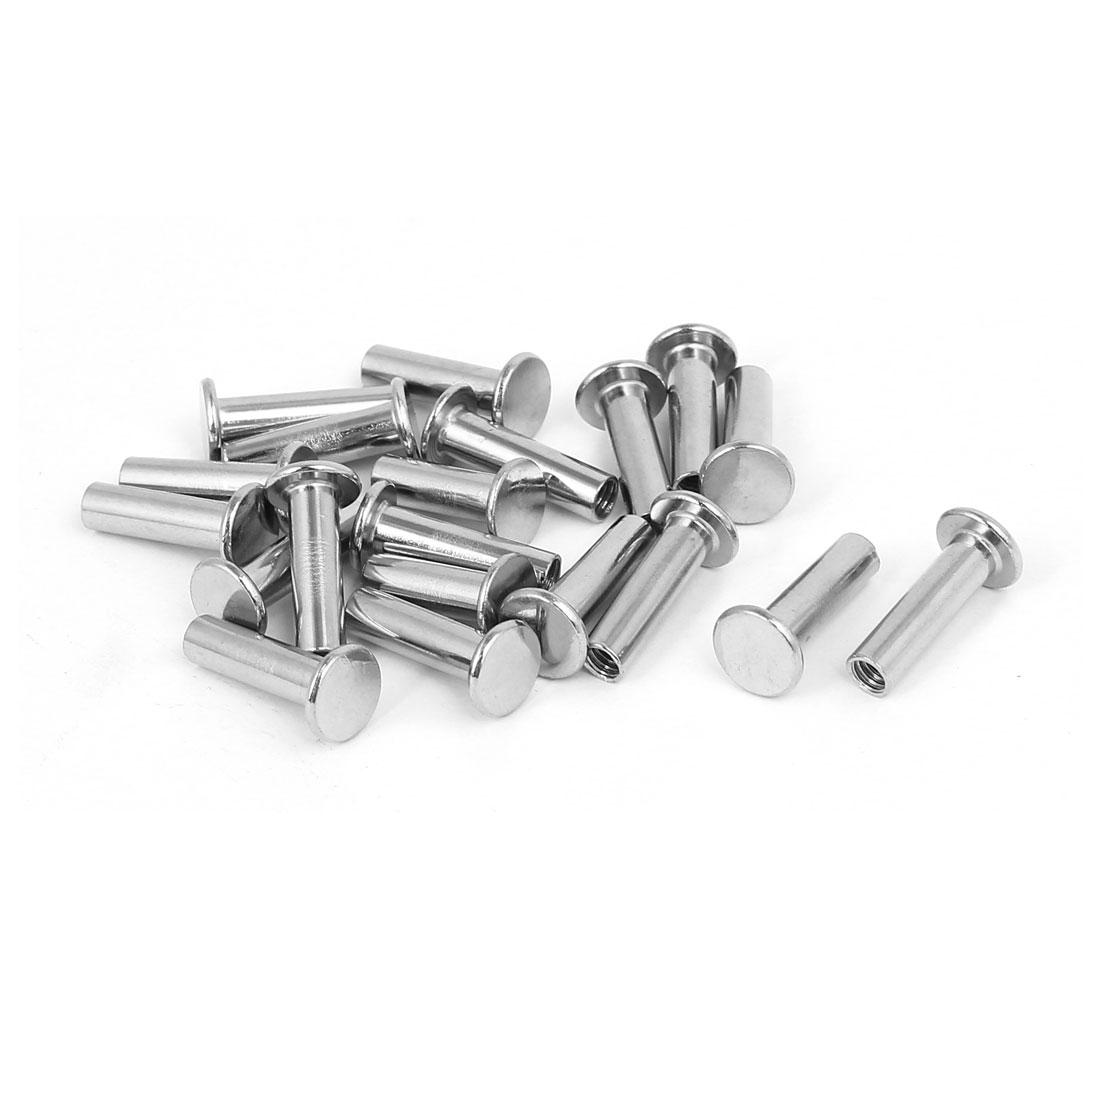 Photo Album Metal Nickel Plated Binding Screw Post Barrel Nut 5mmx17mm 20pcs